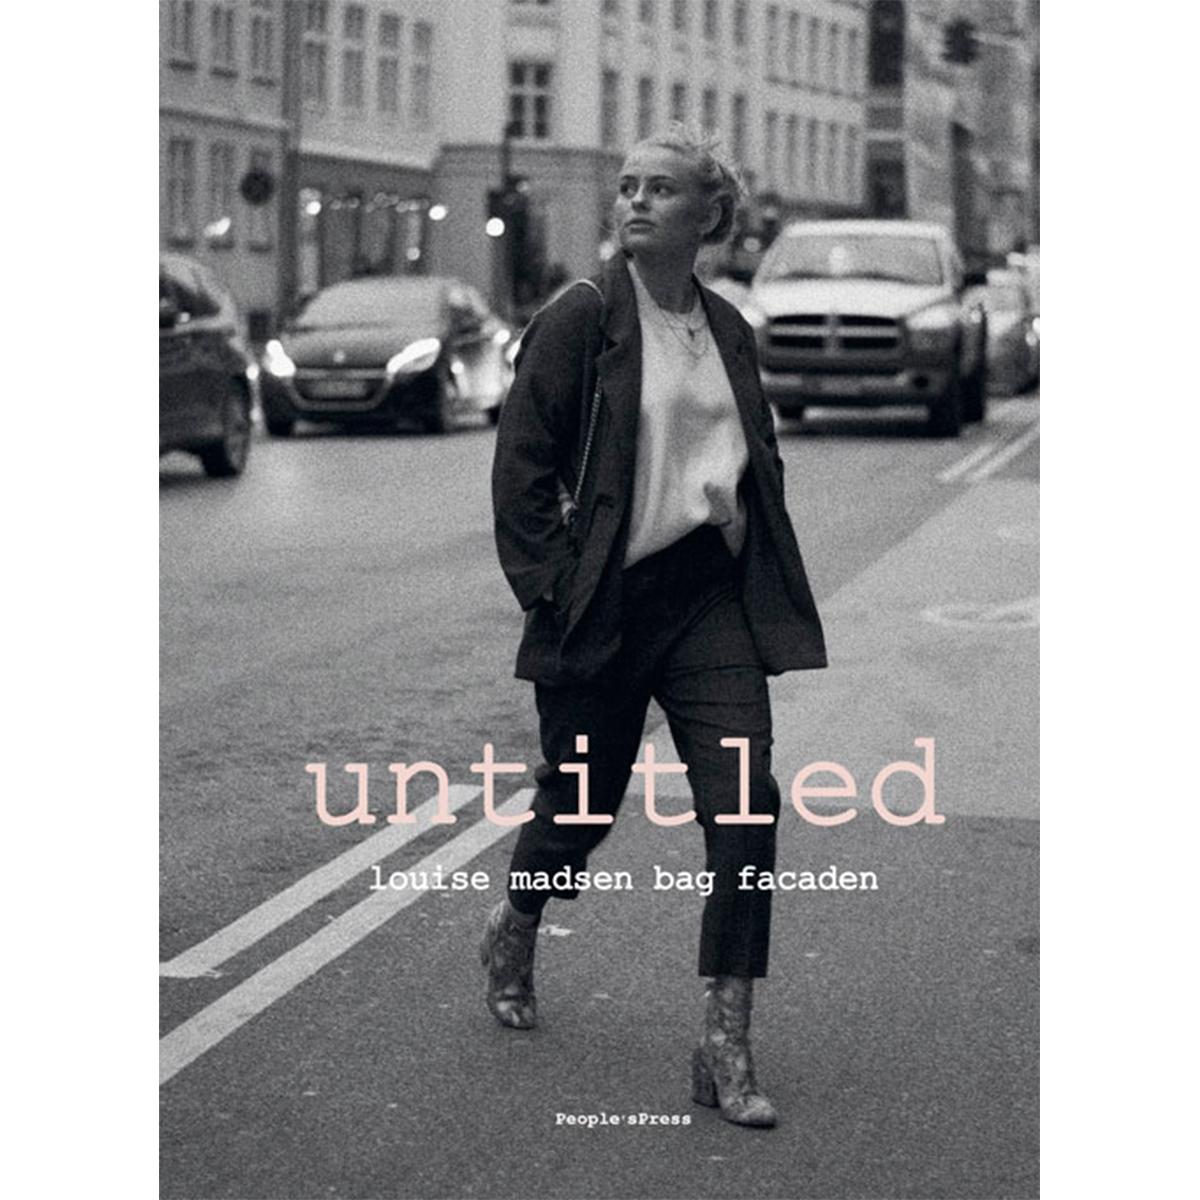 Untitled - Louise Madsen bag facaden - Indbundet